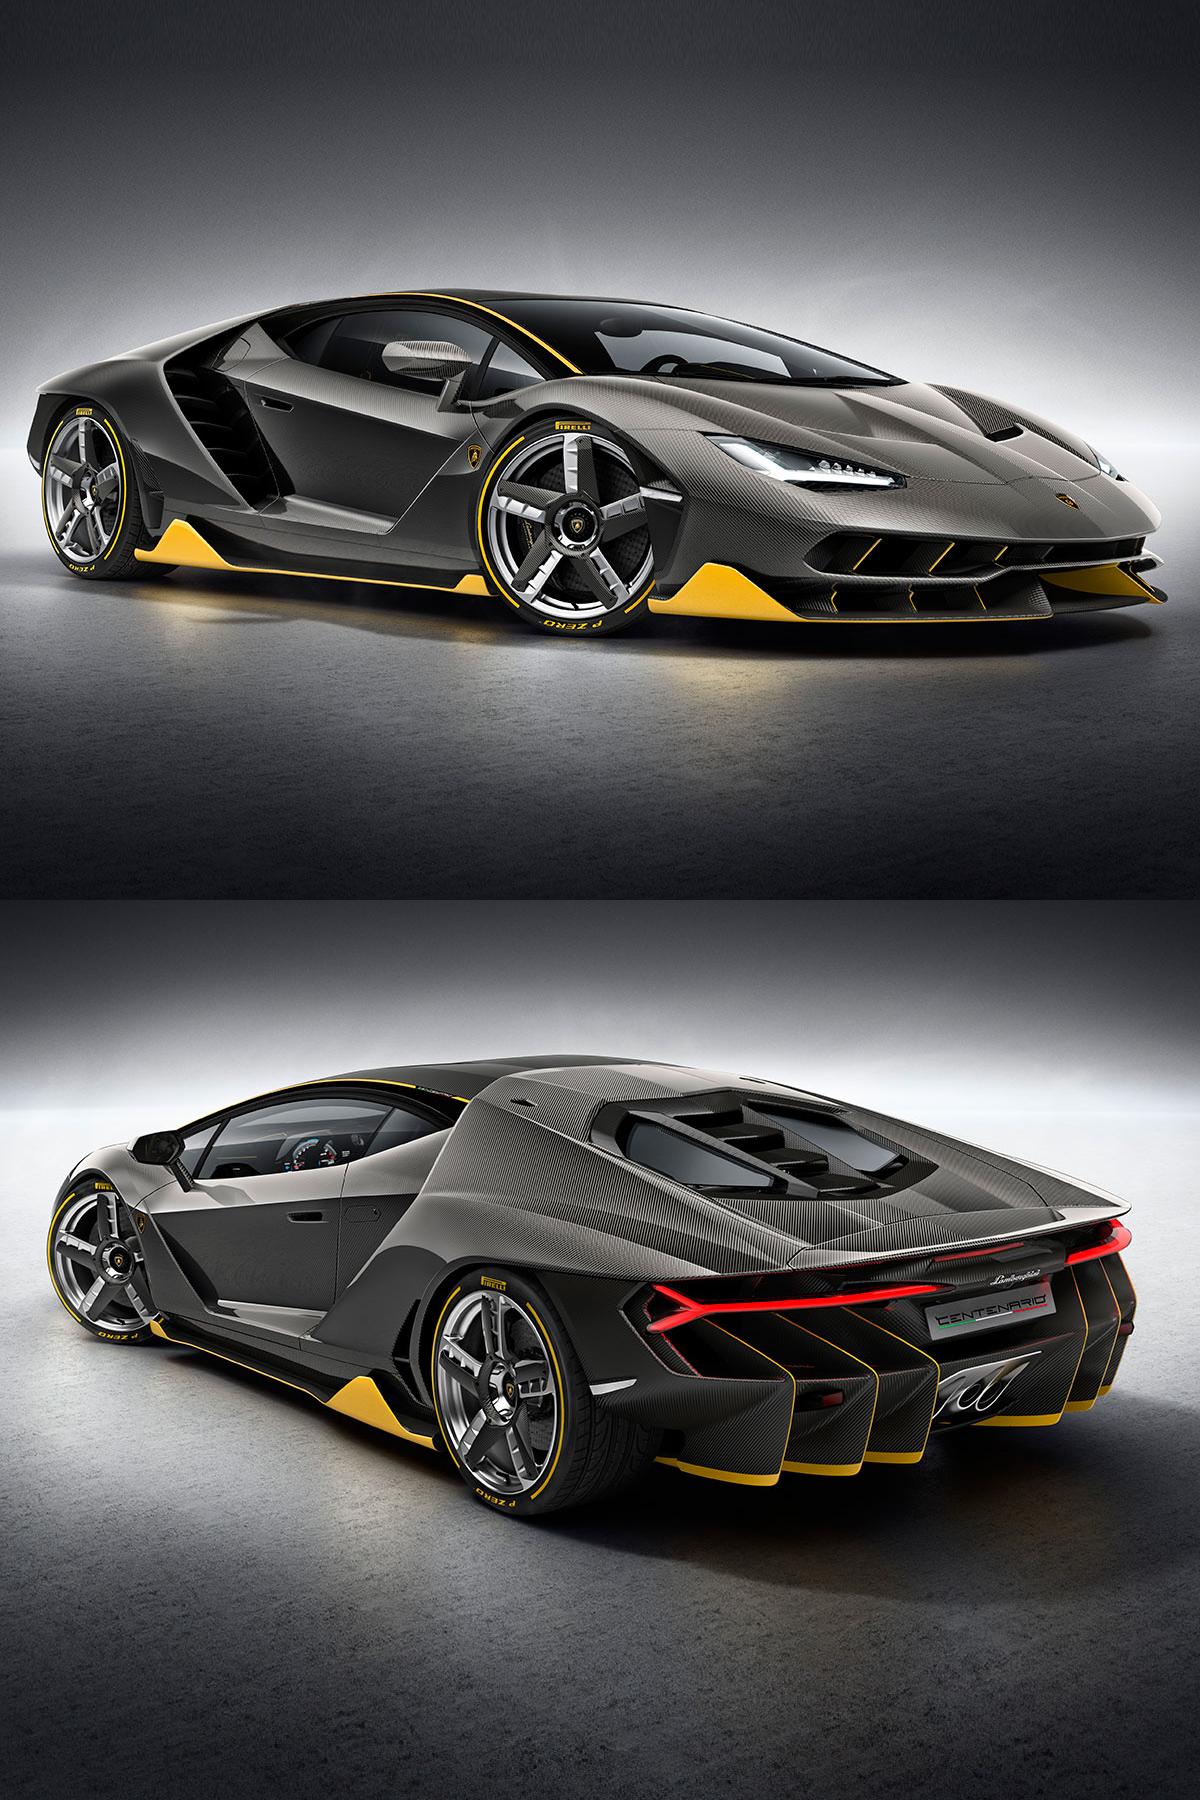 Pin By Gina Wong On Amazing Cars Lamborghini Centenario